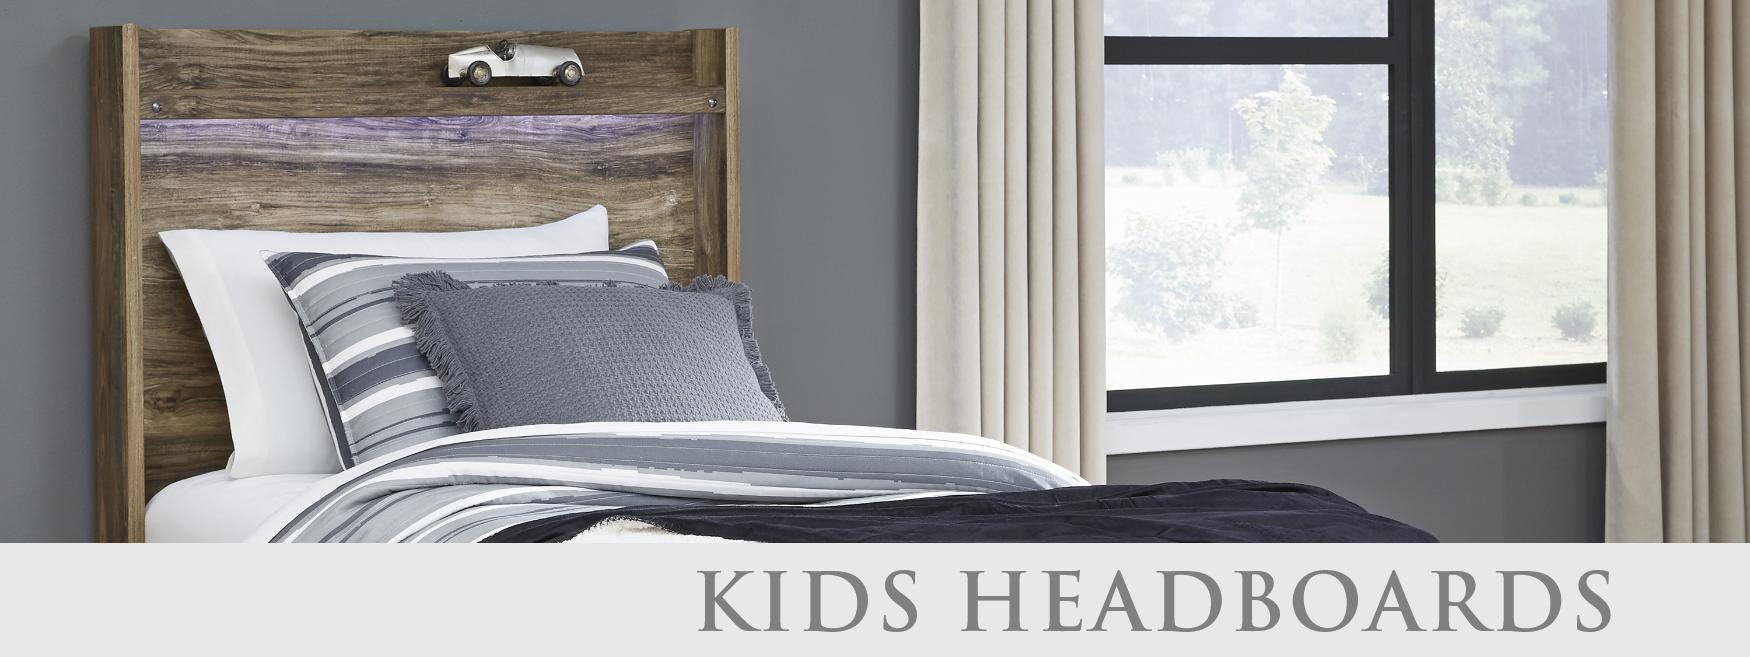 Kid Headboards